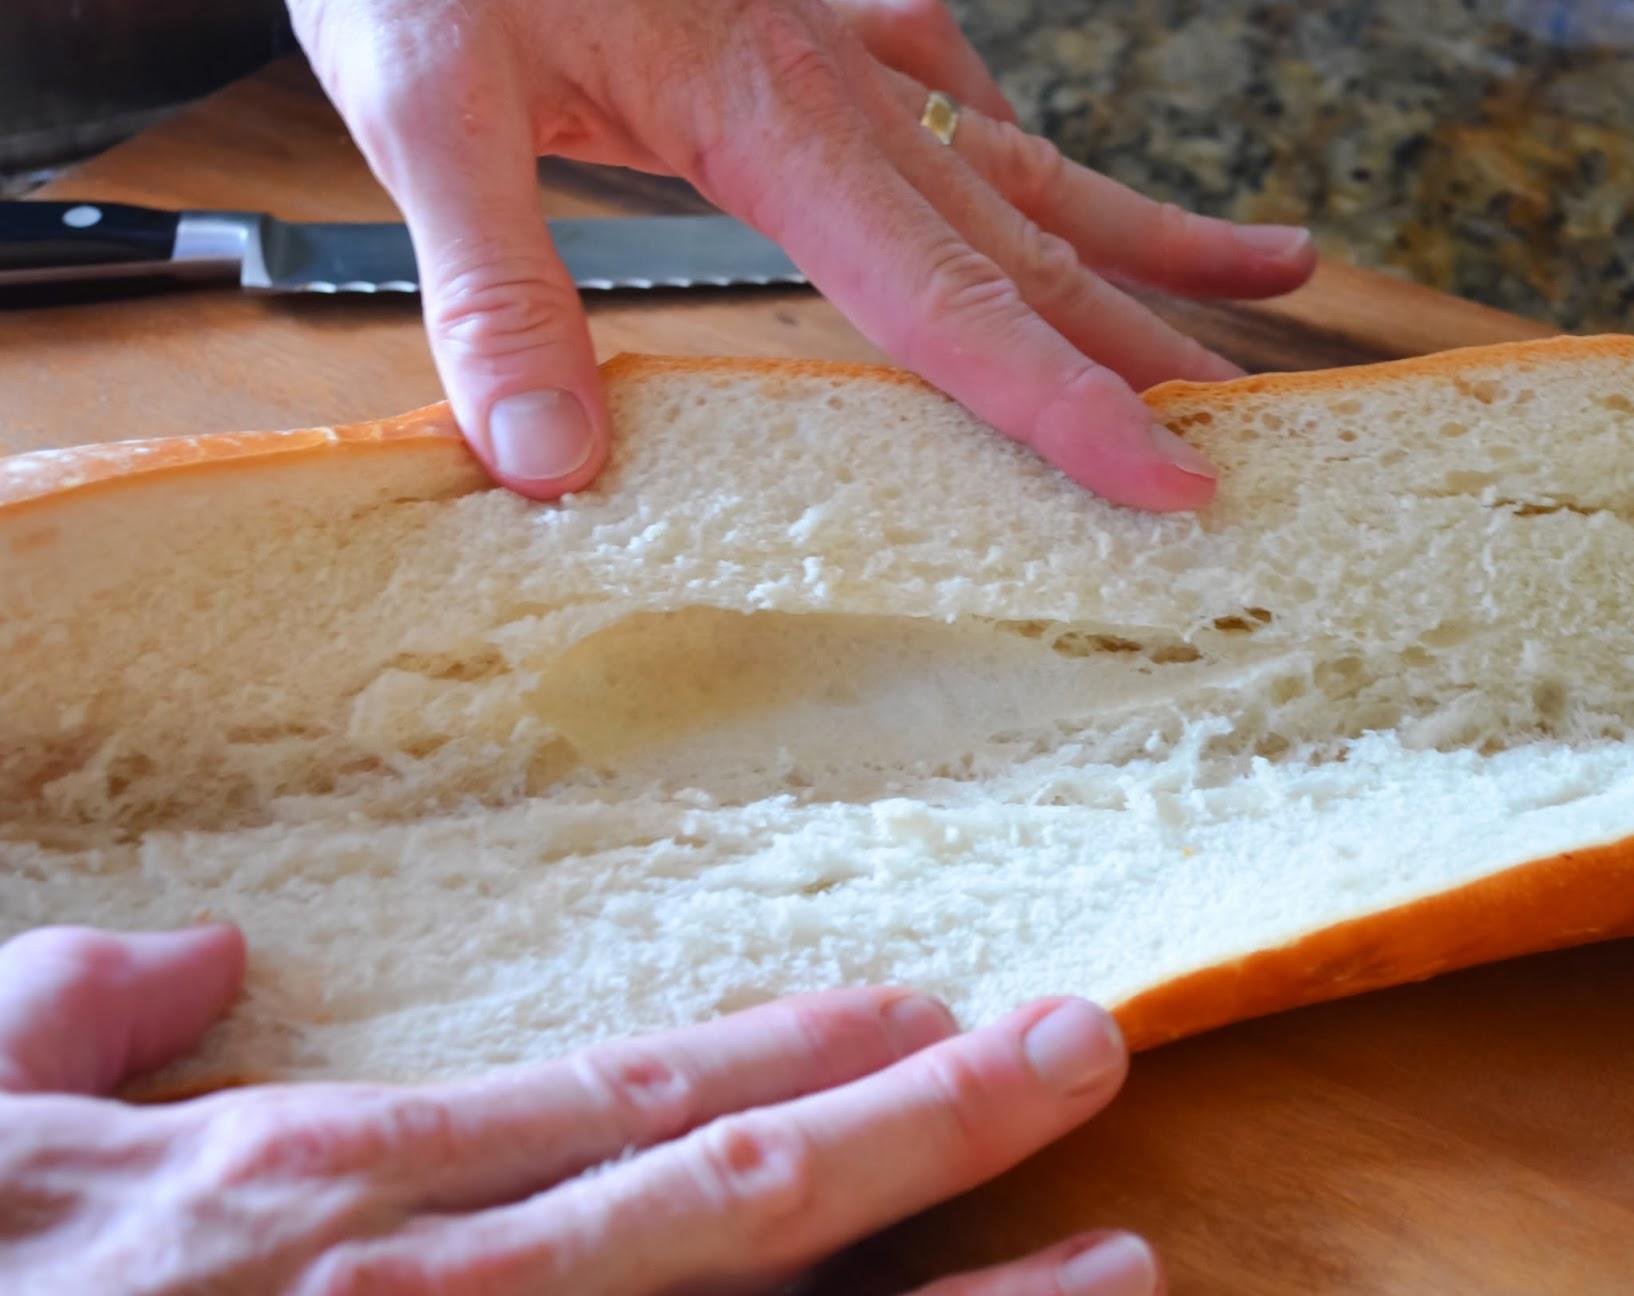 Spicy-Crock-Pot-French-Dips-Cut-Bagette-Half.jpg